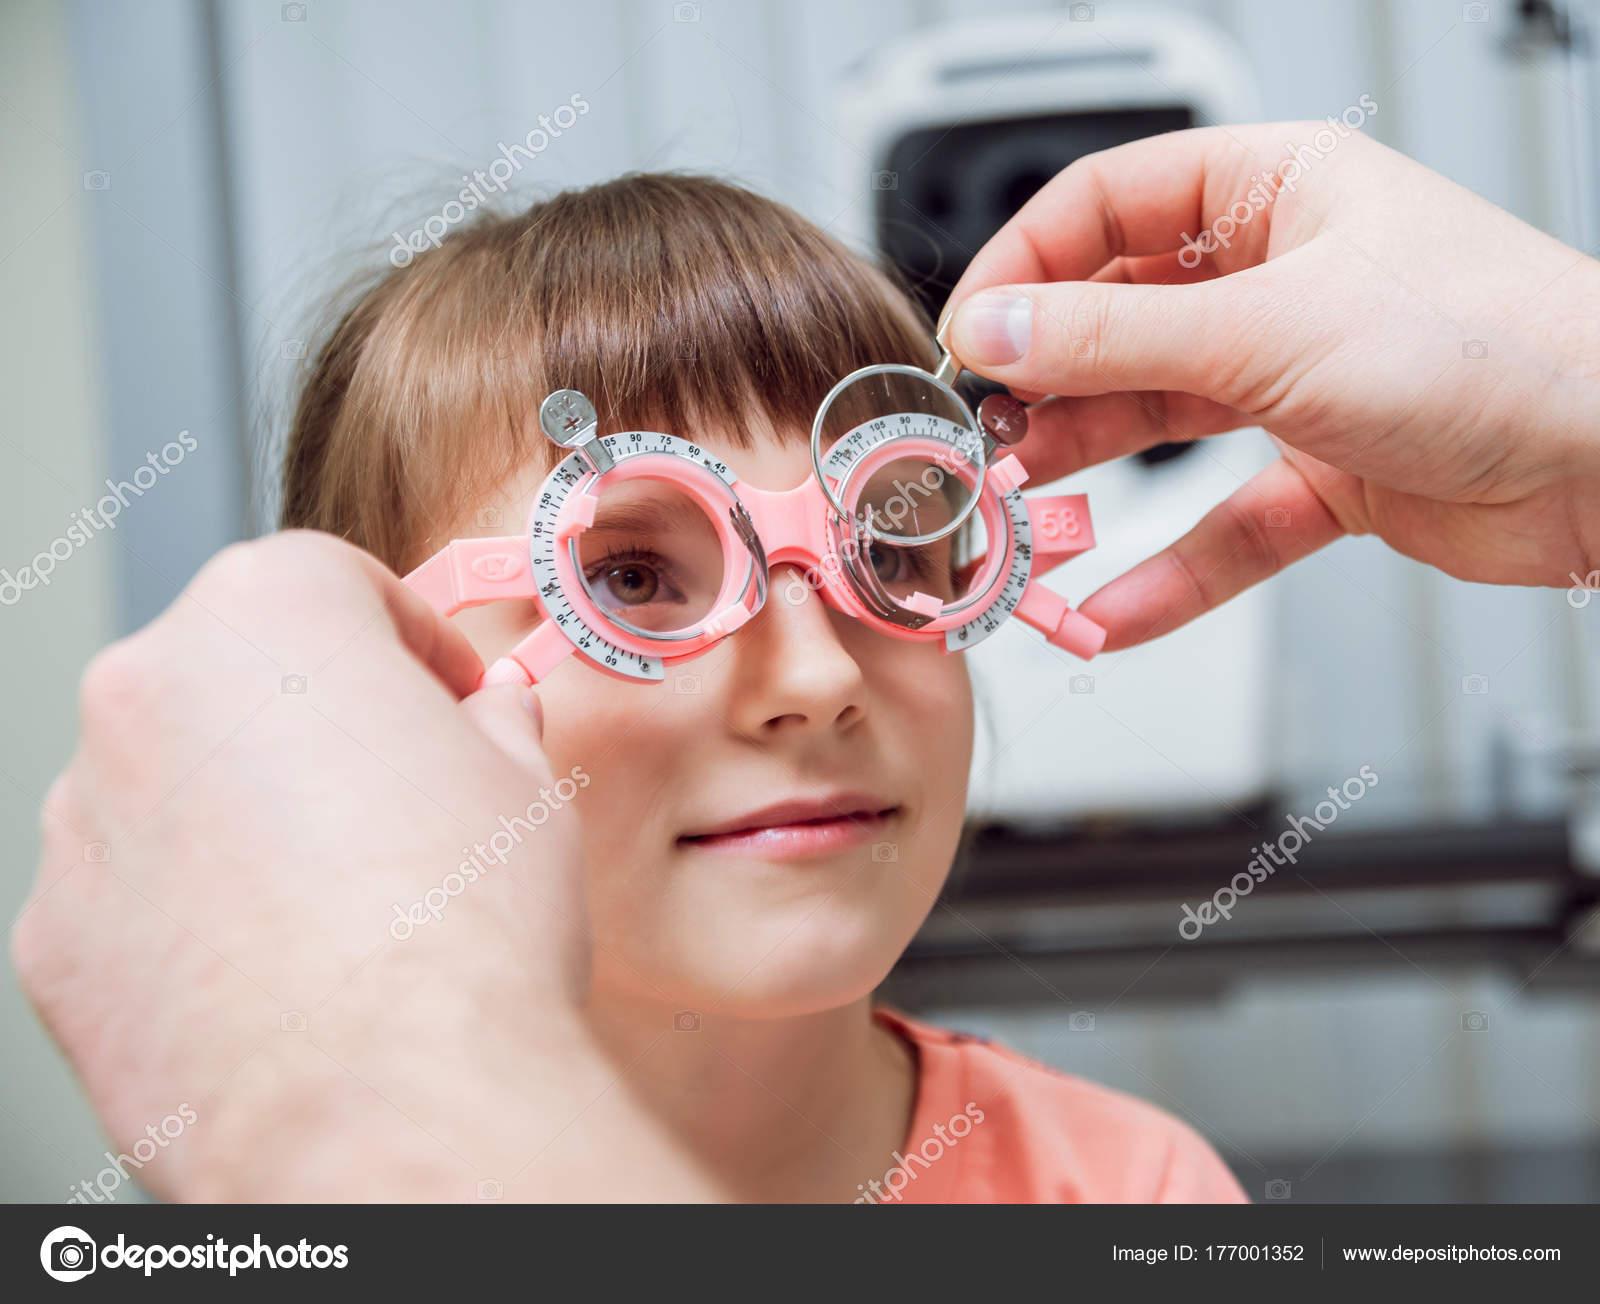 6fd56f67ed Trial Frame Glasses Prescription Child Child Hypermetropy Child  Shortsightedness Child — Stock Photo